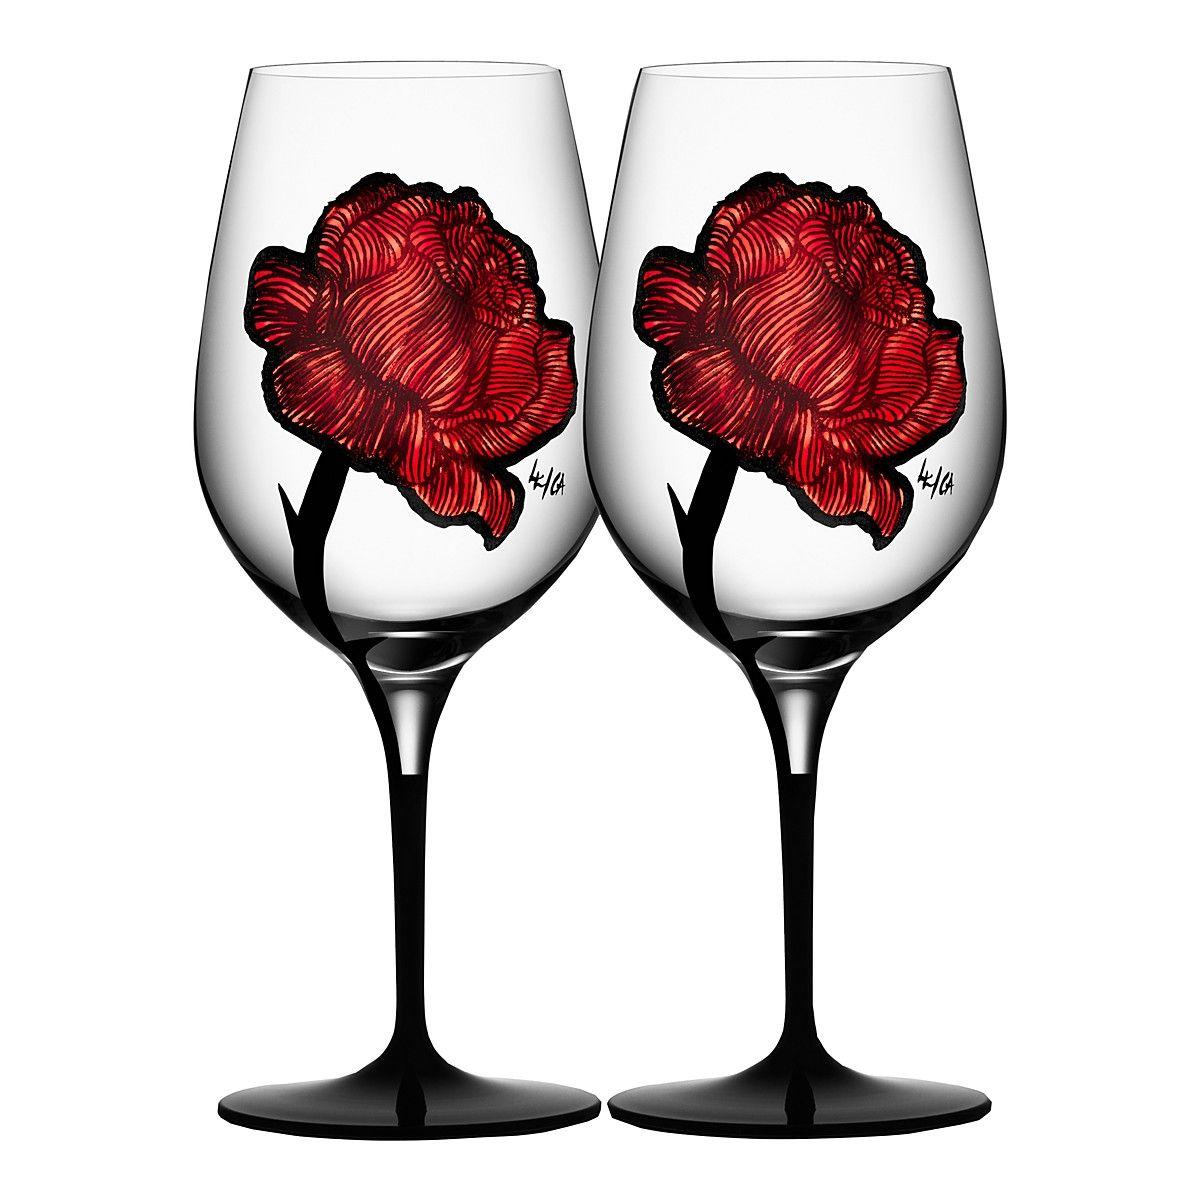 Kosta Boda Tattoo Wine Glasses Set Of 2 Kosta Boda Wine Glass Wine Glasses